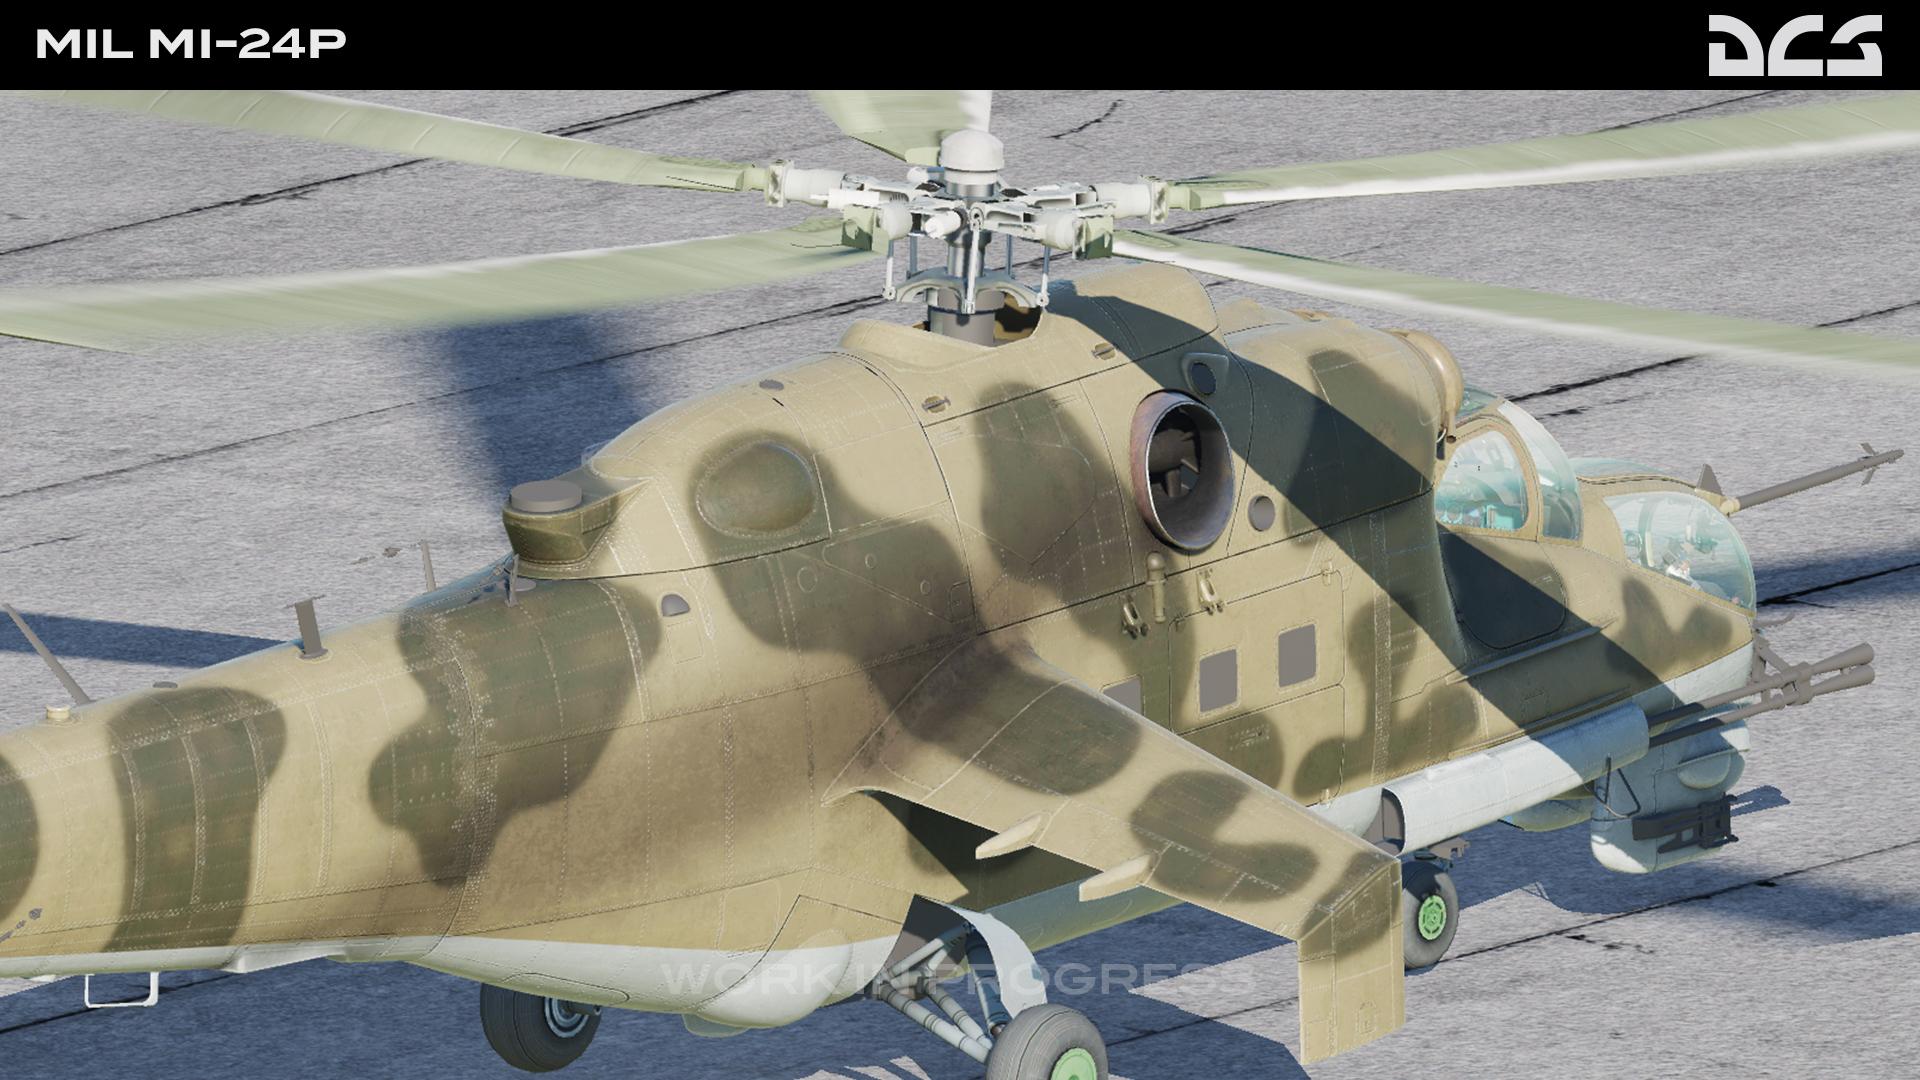 mi-24p-wip-dcs-world.jpg